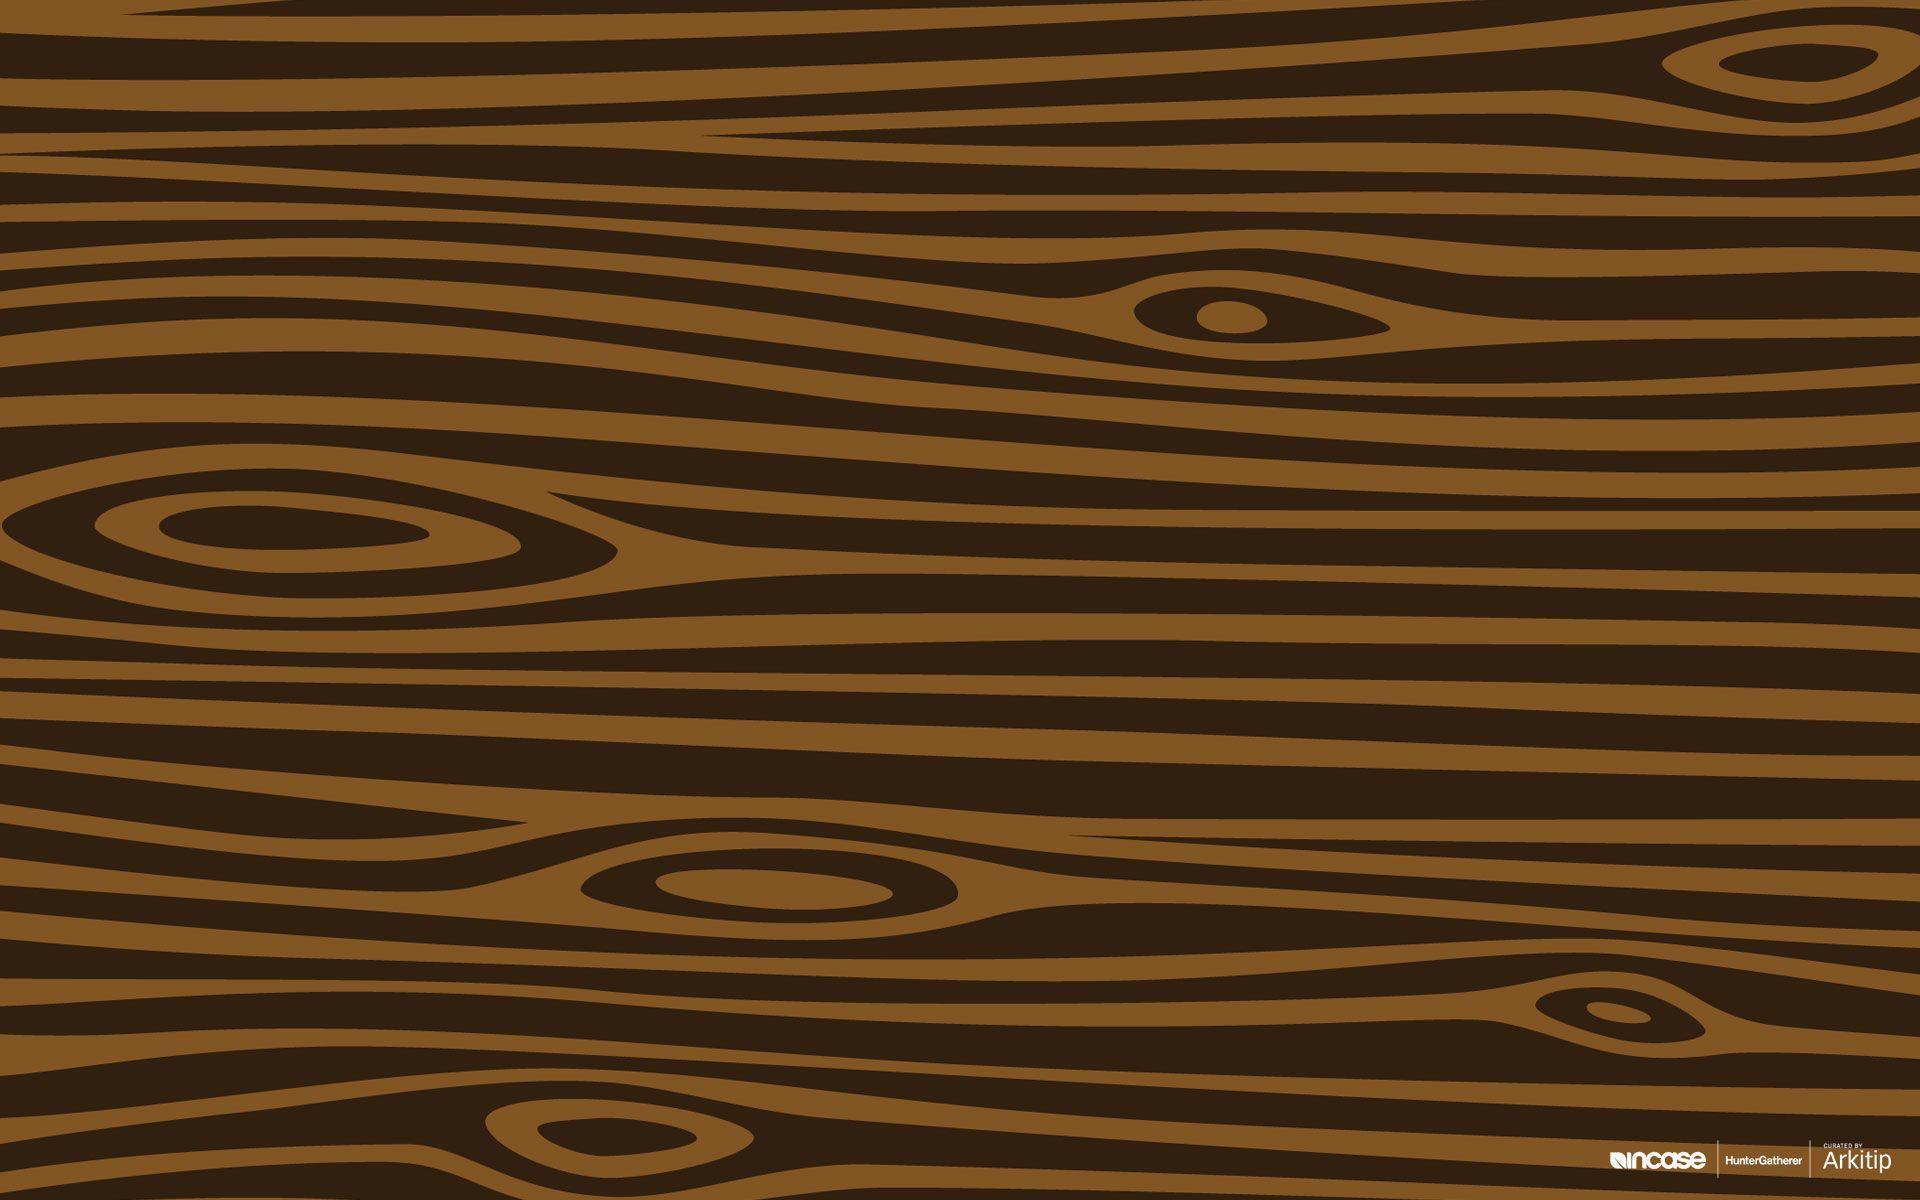 Day 31 Wood Grain Wallpaper! Wood grain wallpaper, Wood